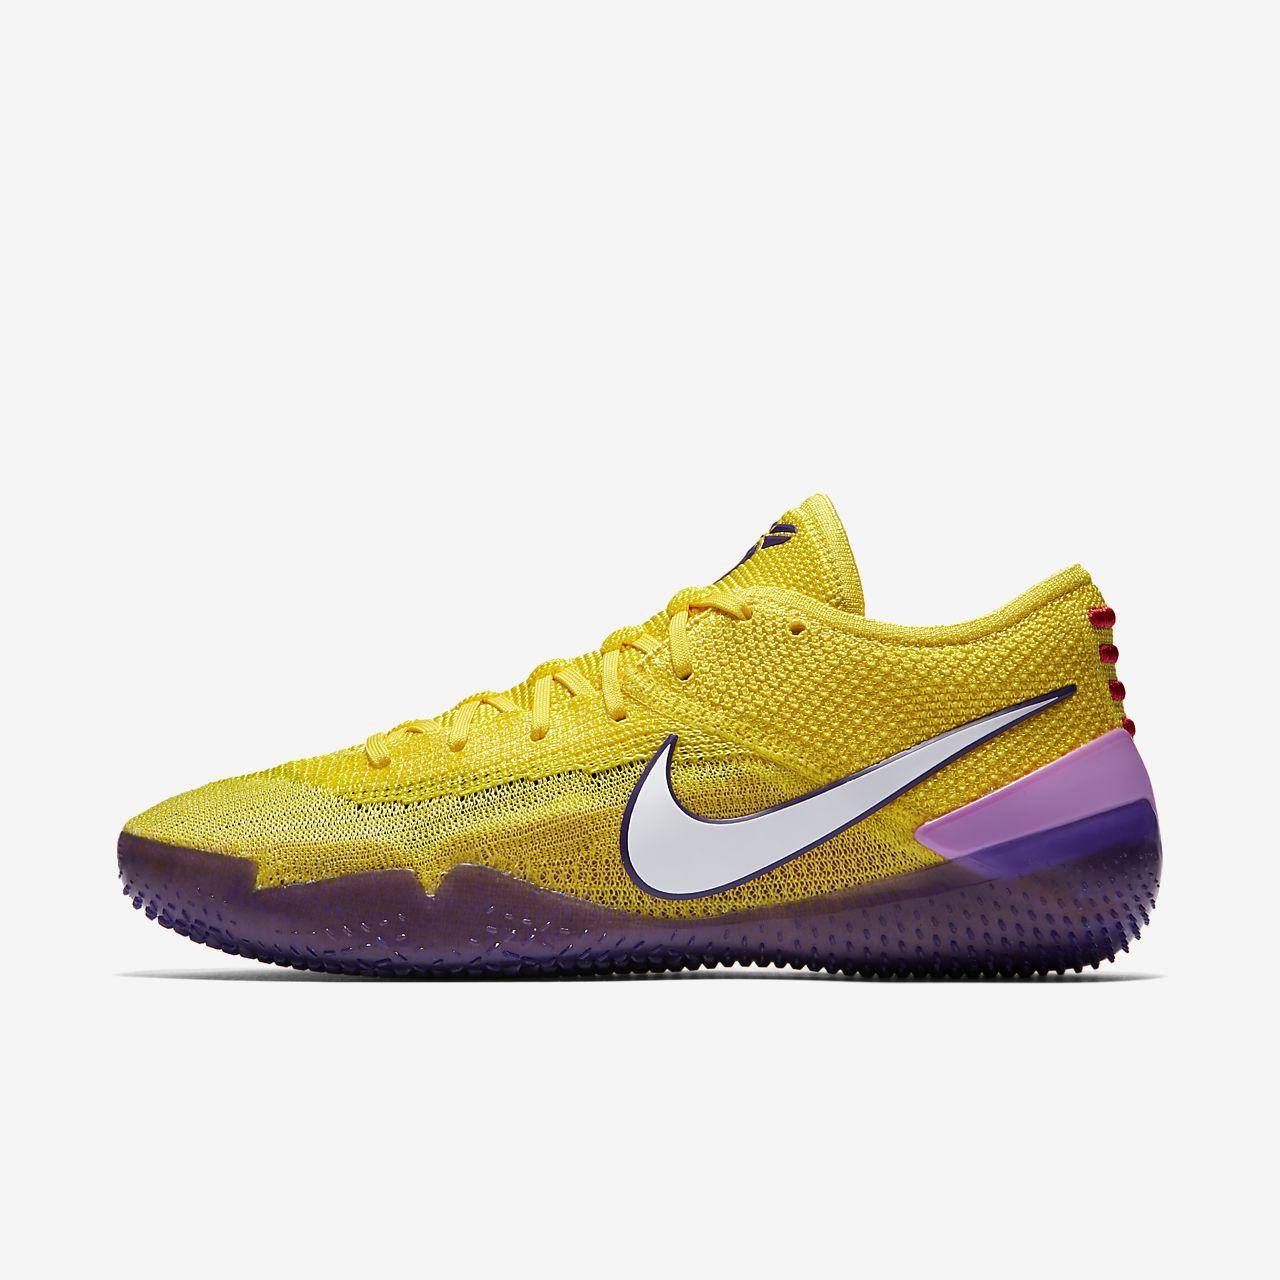 Kobe Ad Nxt 360 Basketballschuh Nikecom De